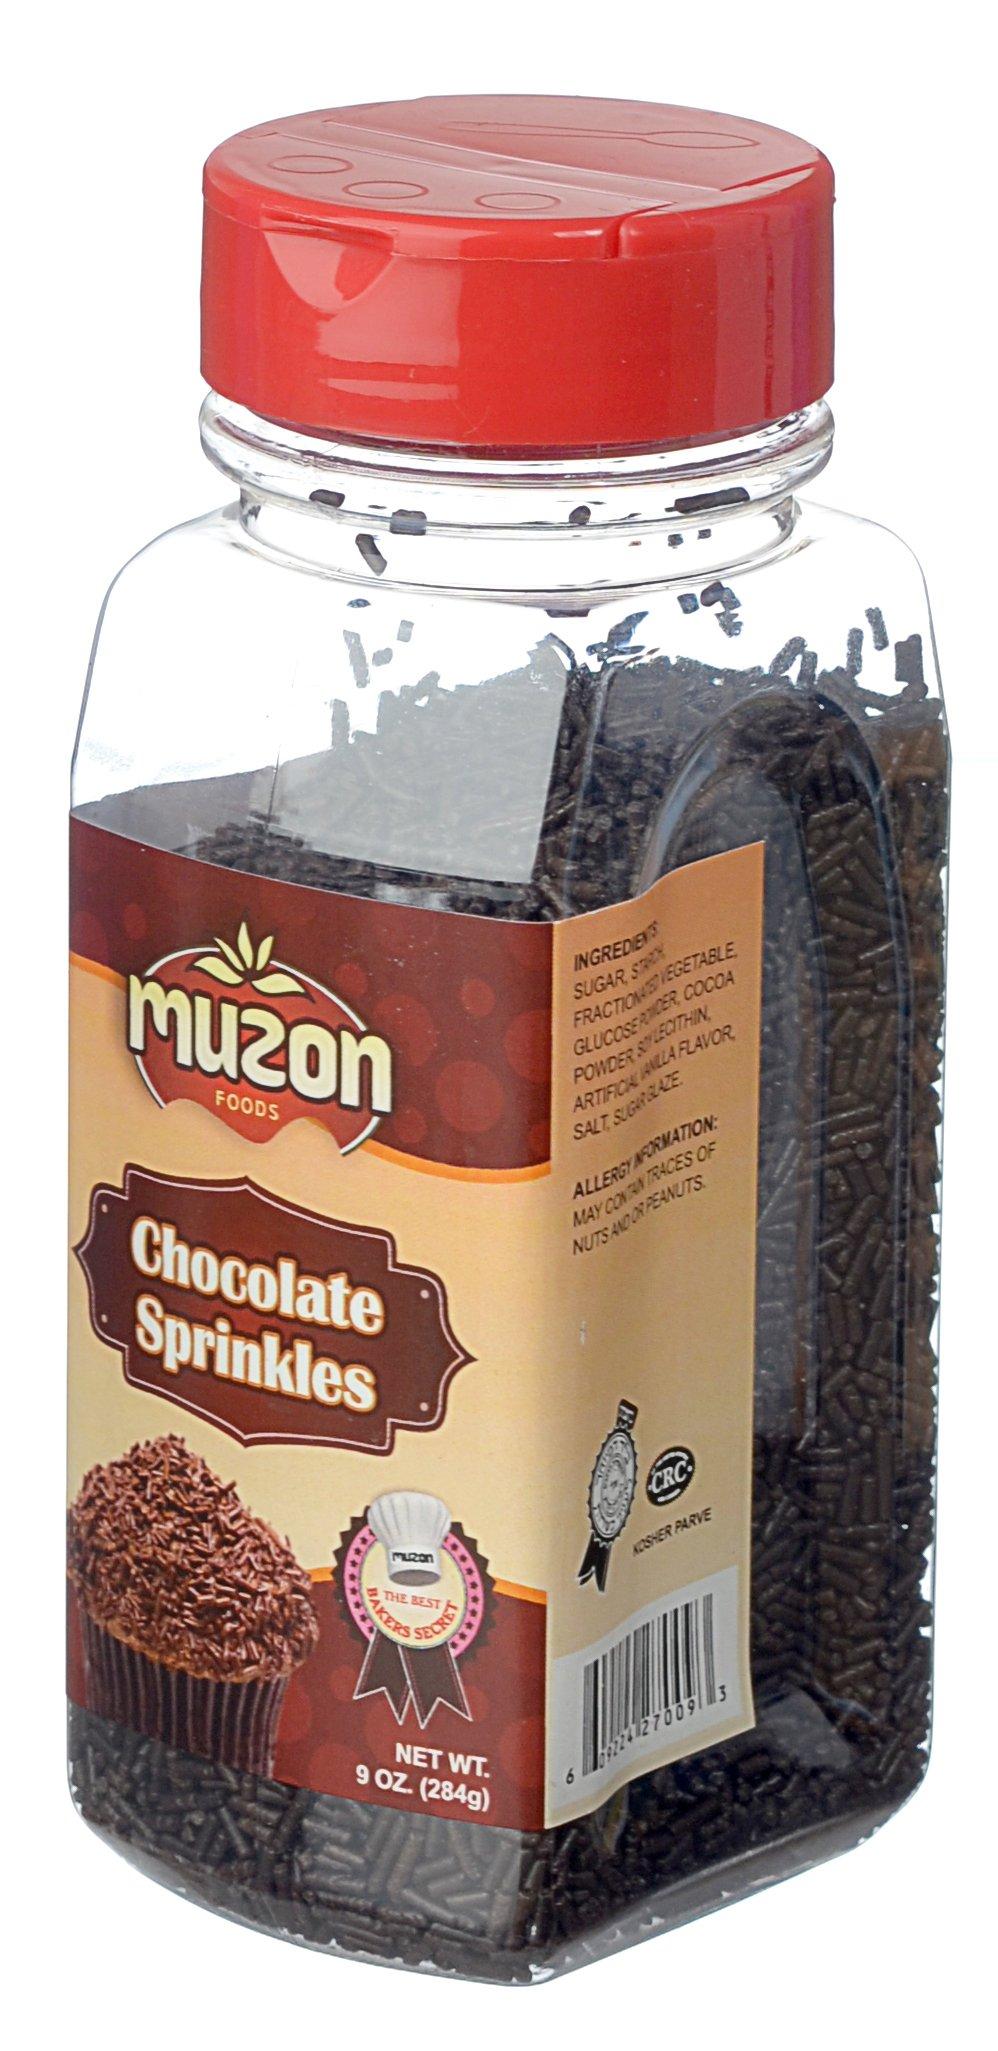 Muzon Chocolate Sprinkles, Sprinkles Chocolate Flavored, Chocolate Jimmies Food Decorative,